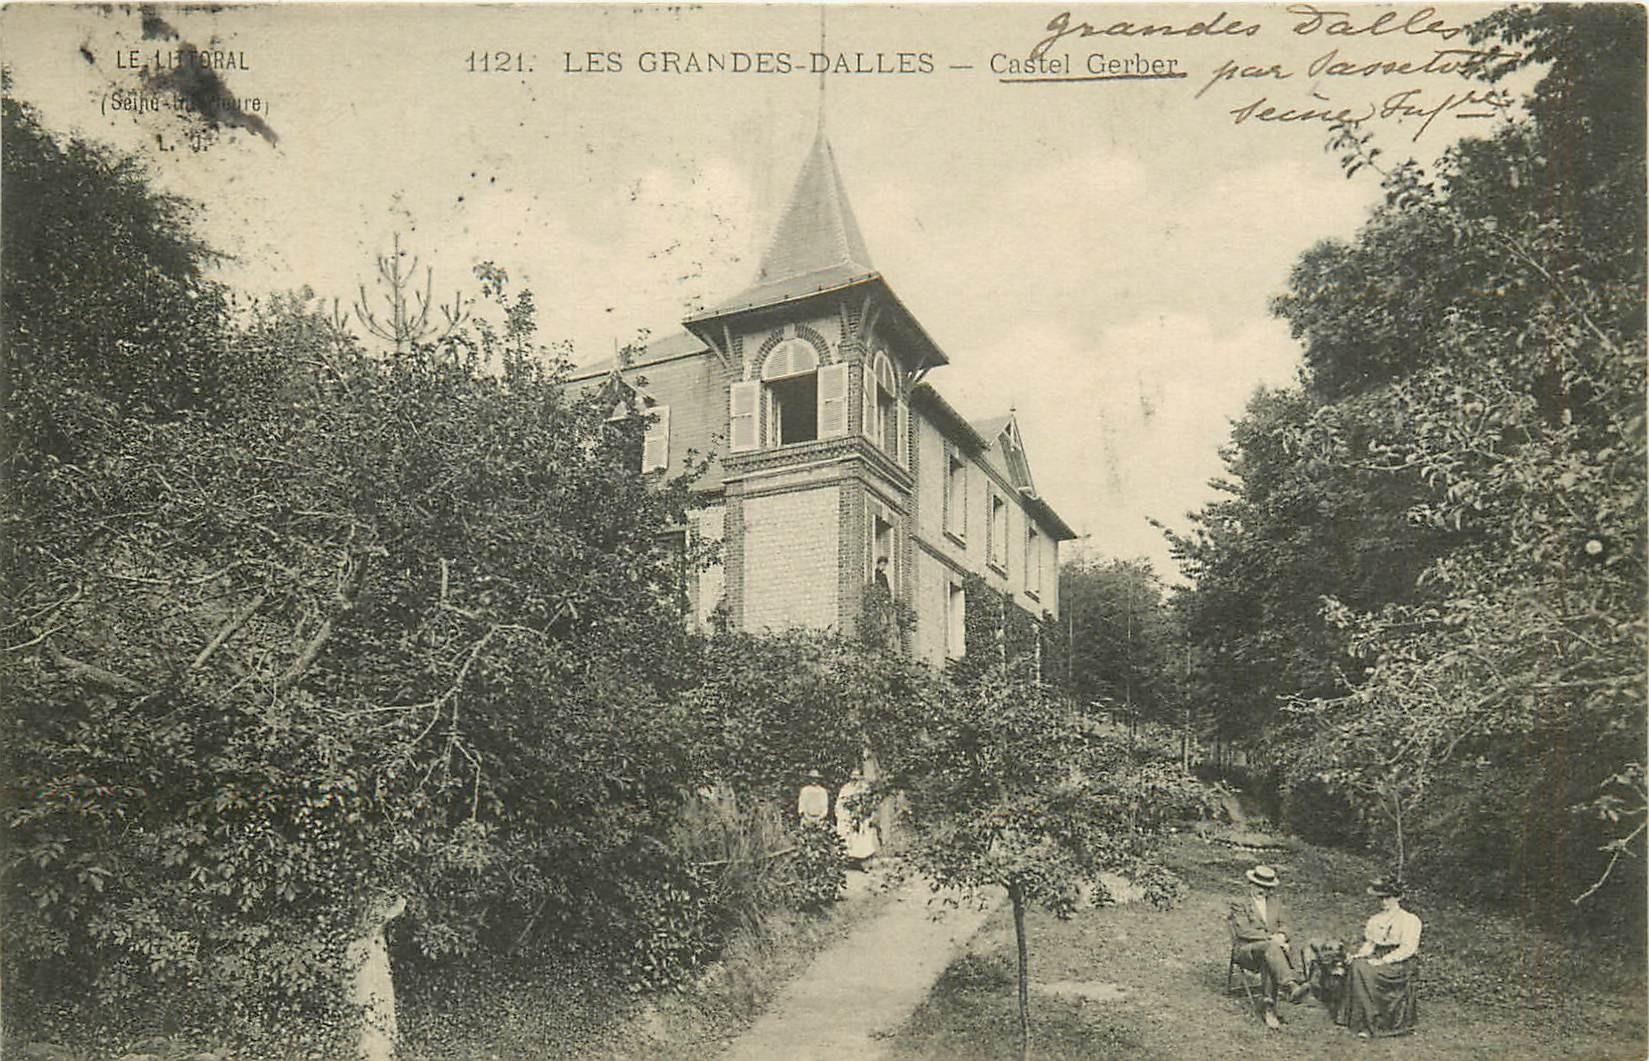 76 LES GRANDES DALLES. Castel Gerber 1908 animation